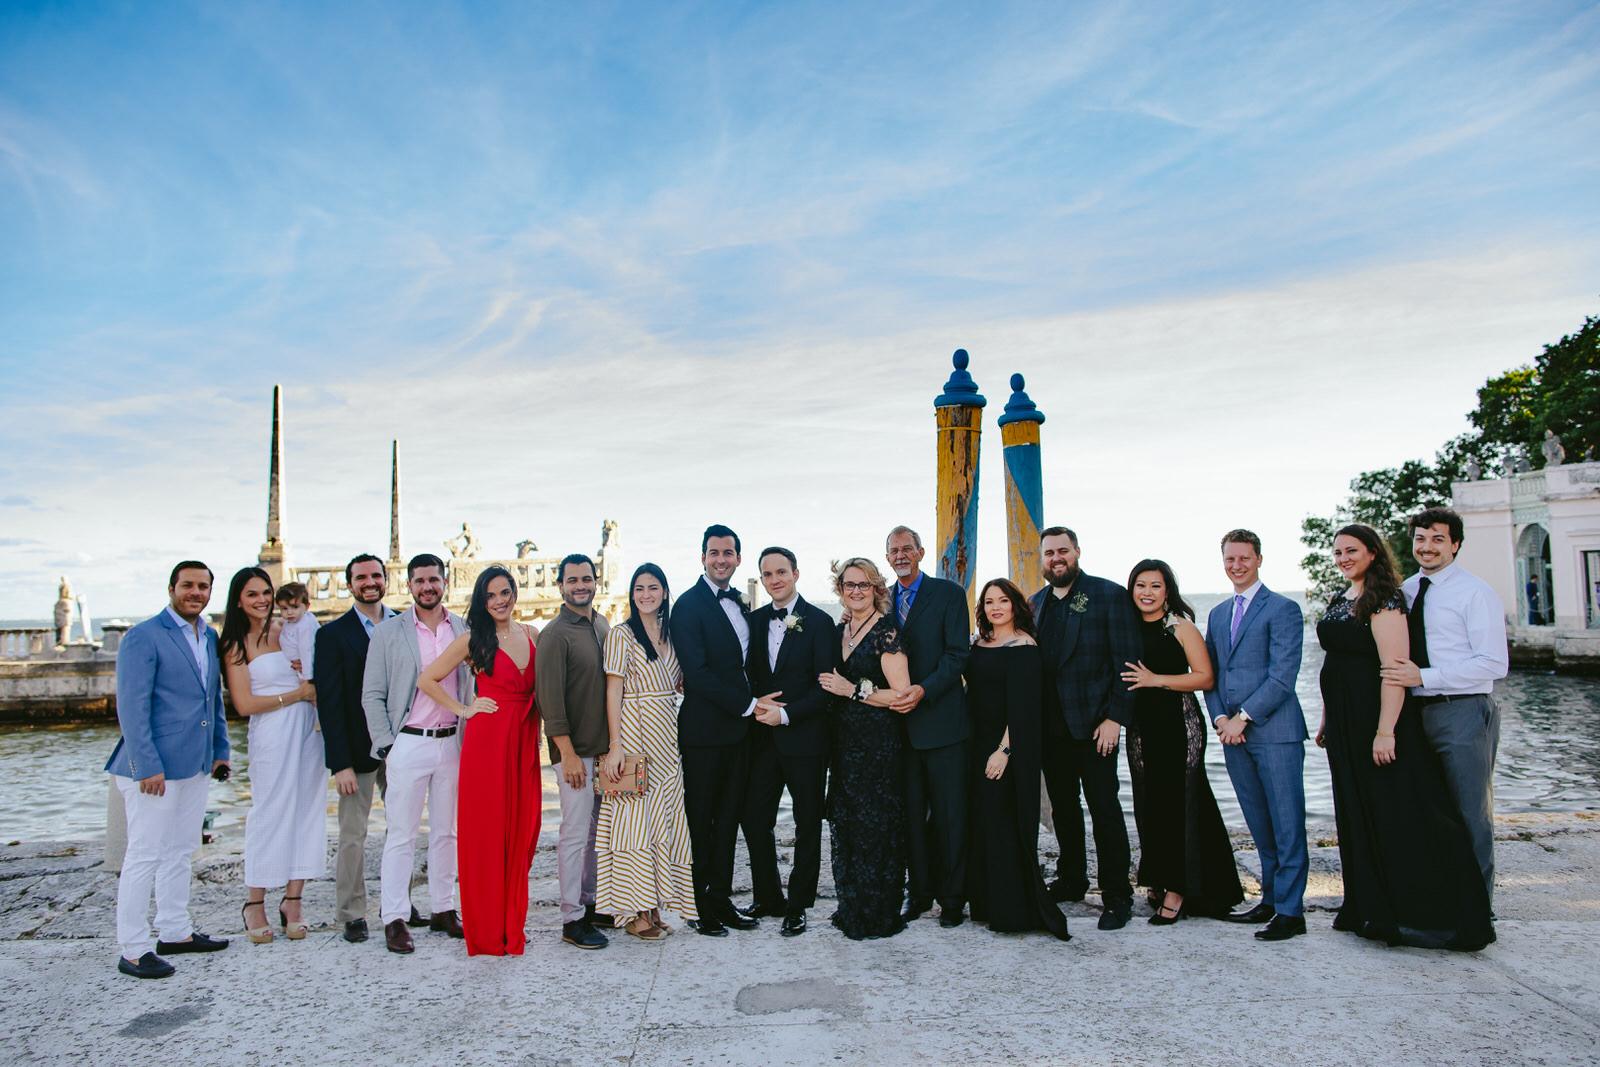 vizcaya_elopement_intimate_wedding_after_ceremony_portraits-14.jpg